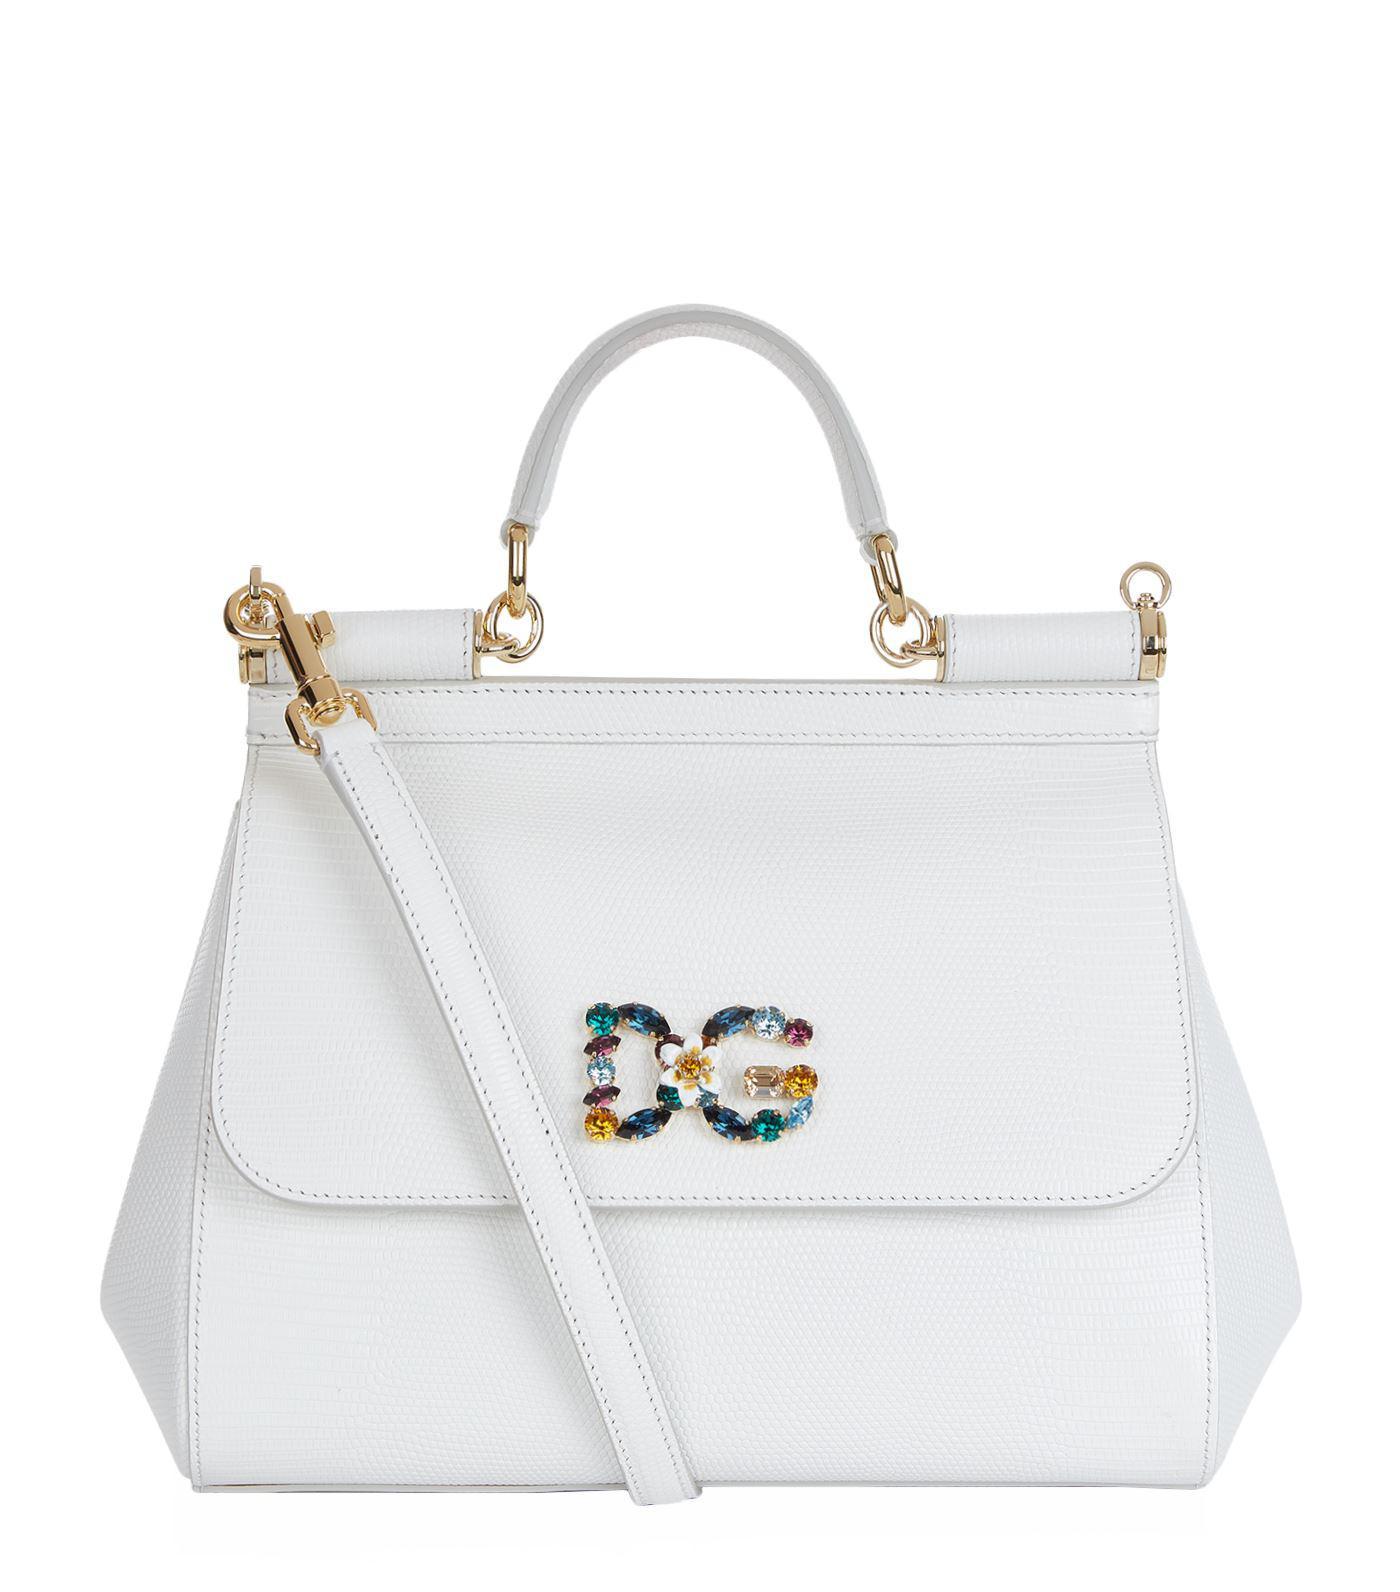 5865f5c5fd Dolce & Gabbana Medium Leather Iguana Print Sicily Bag in White - Lyst